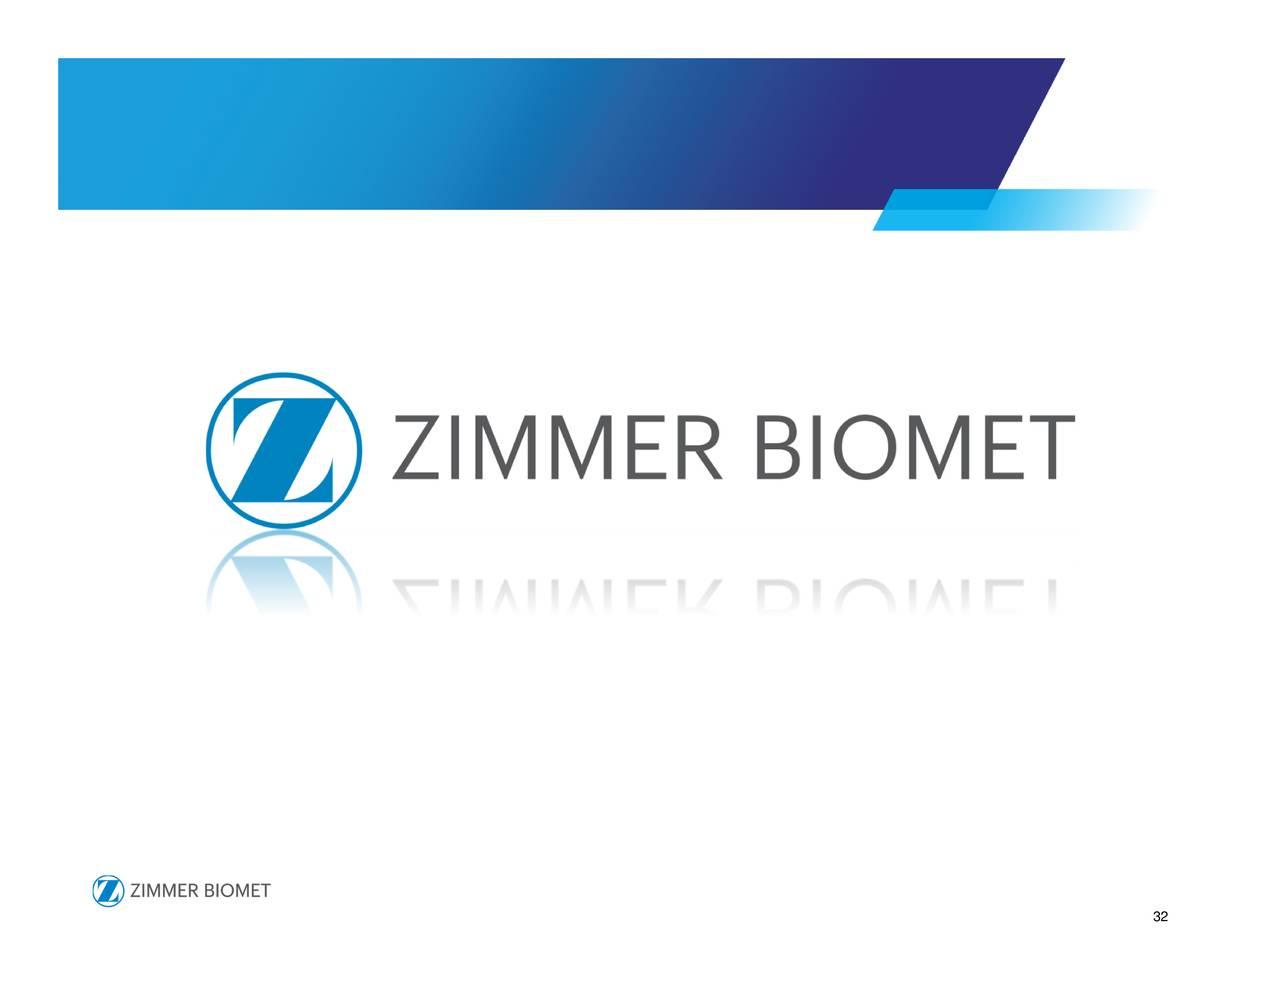 Zimmer biomet holdings inc 2017 q4 results earnings for Zimmer holdings